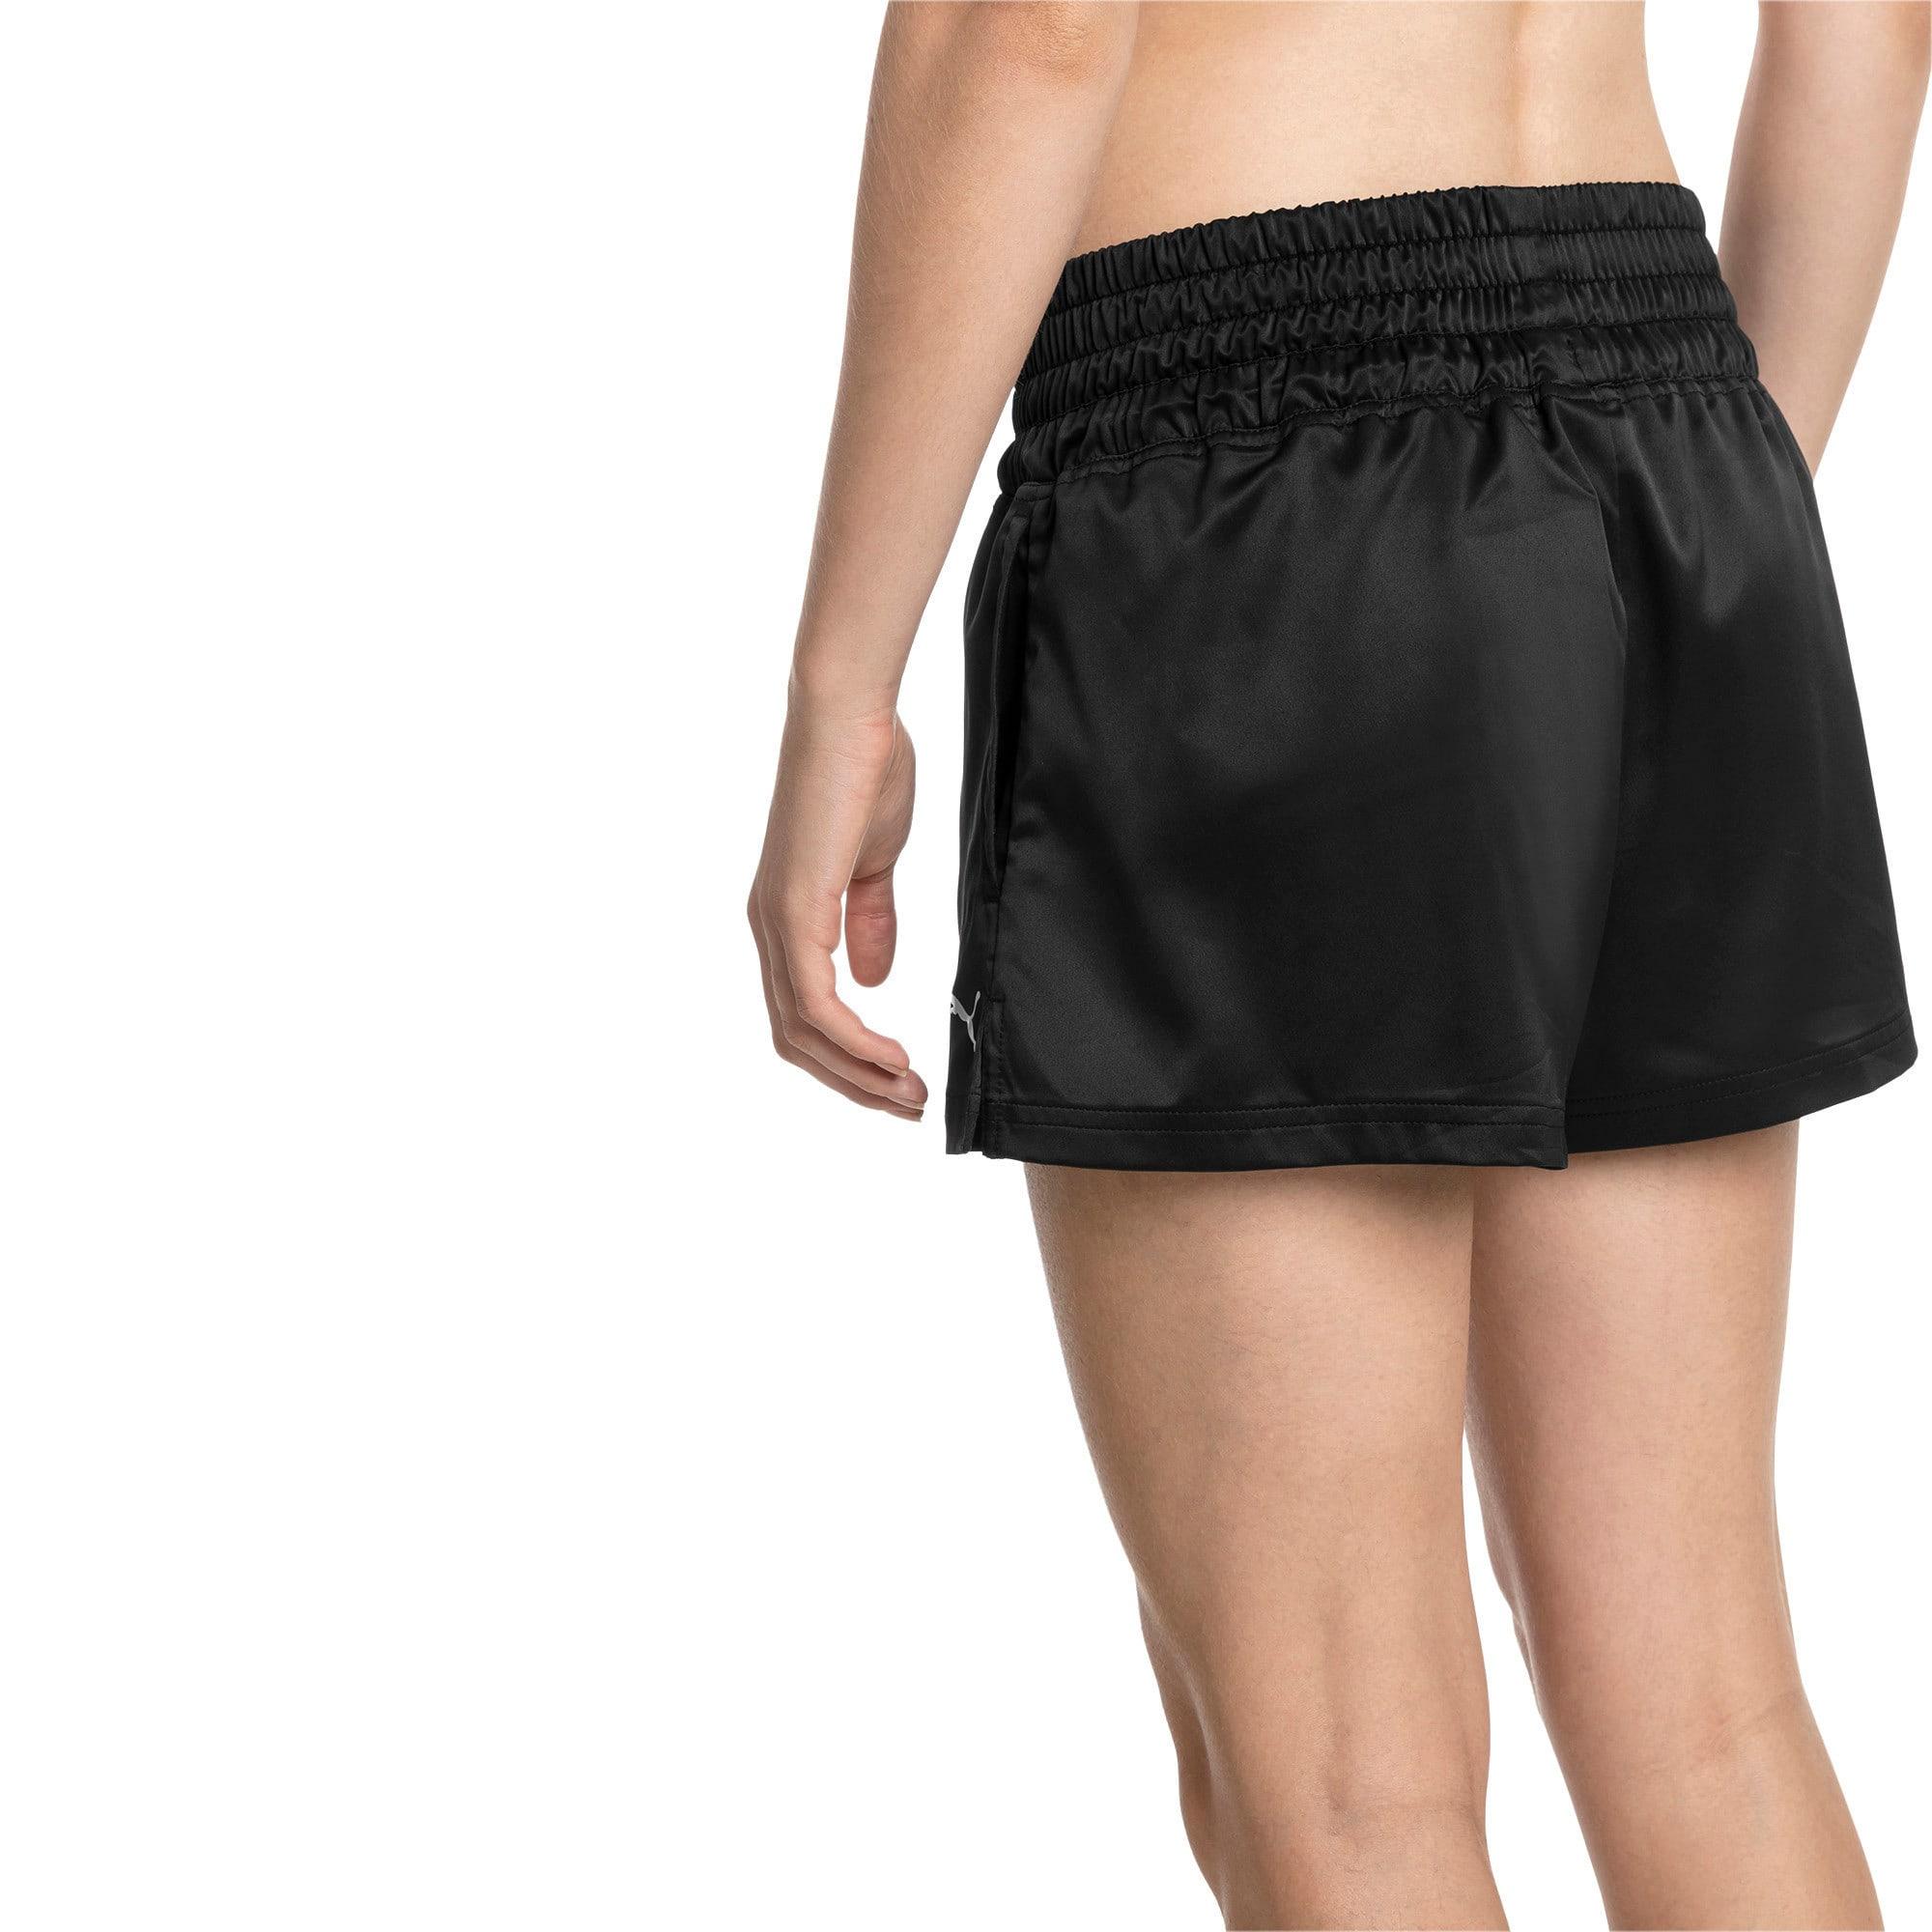 Thumbnail 2 of On the Brink Women's Shorts, Puma Black, medium